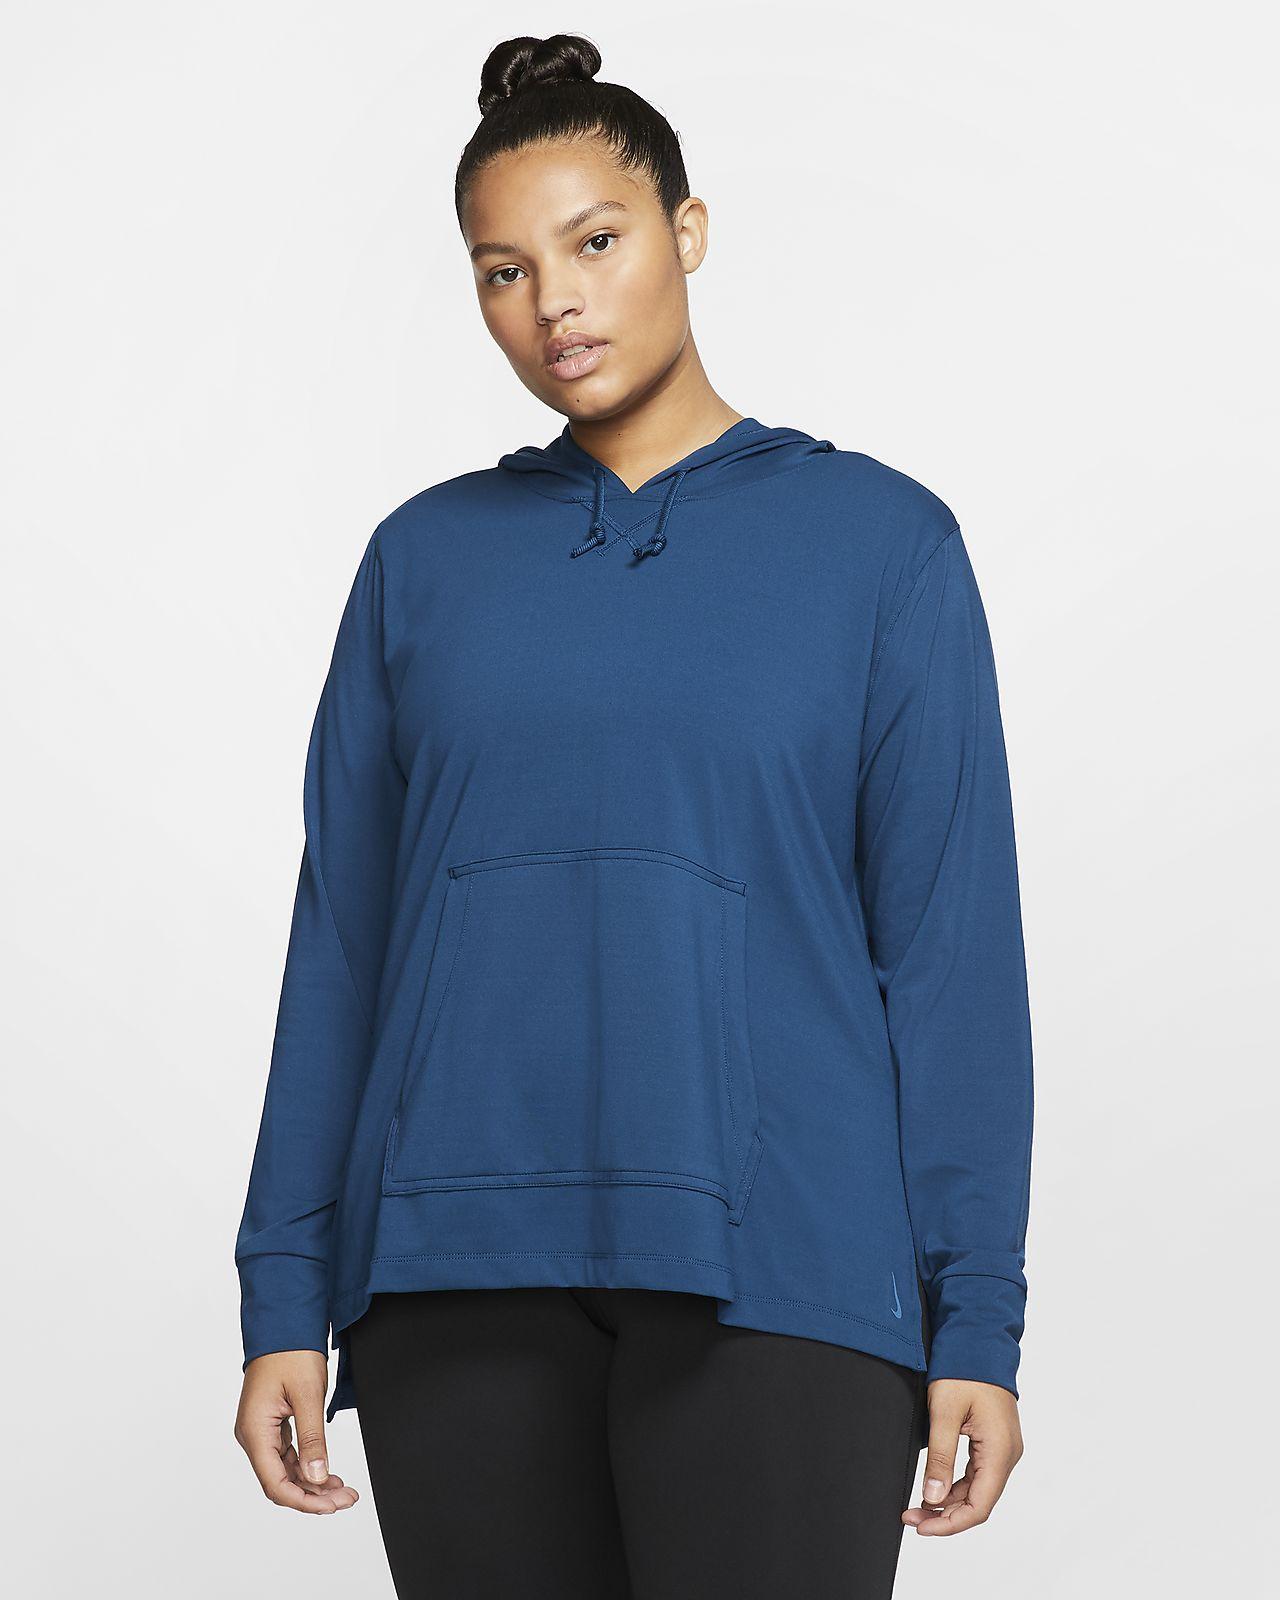 Nike Yoga Women's Hoodie (Plus Size)